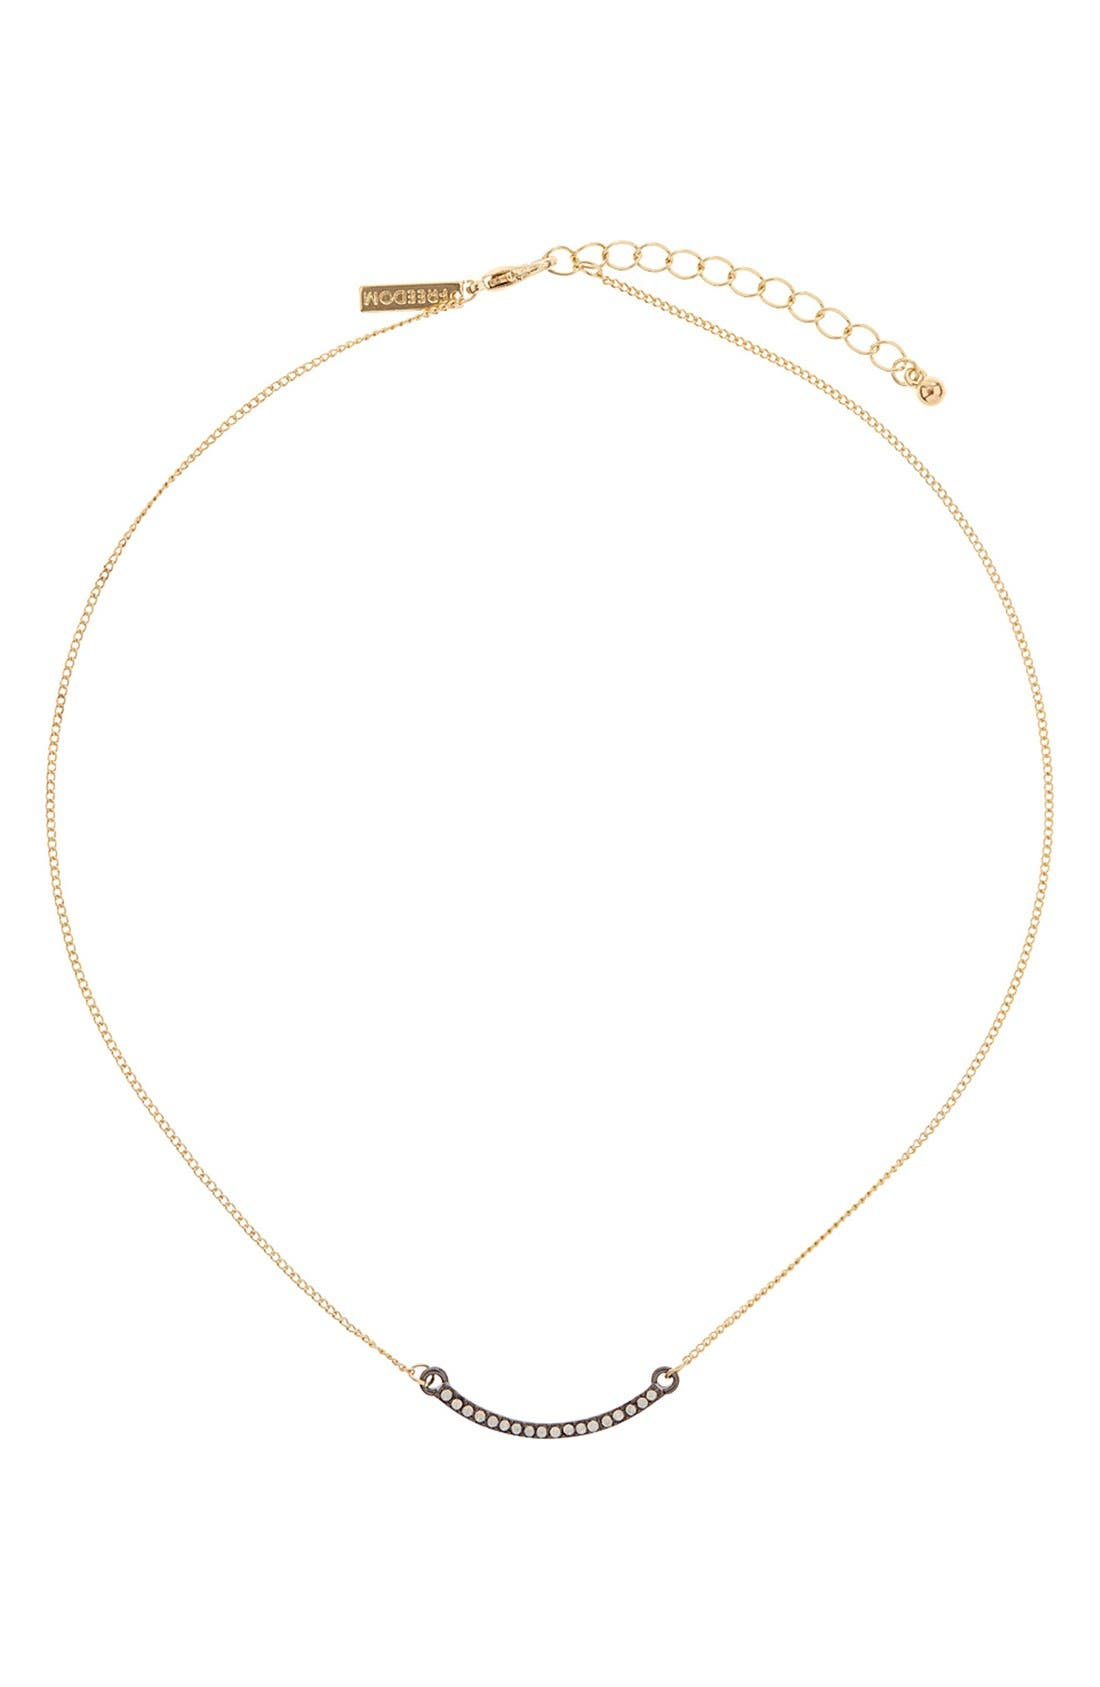 Alternate Image 1 Selected - Topshop Diamante Bar Necklace